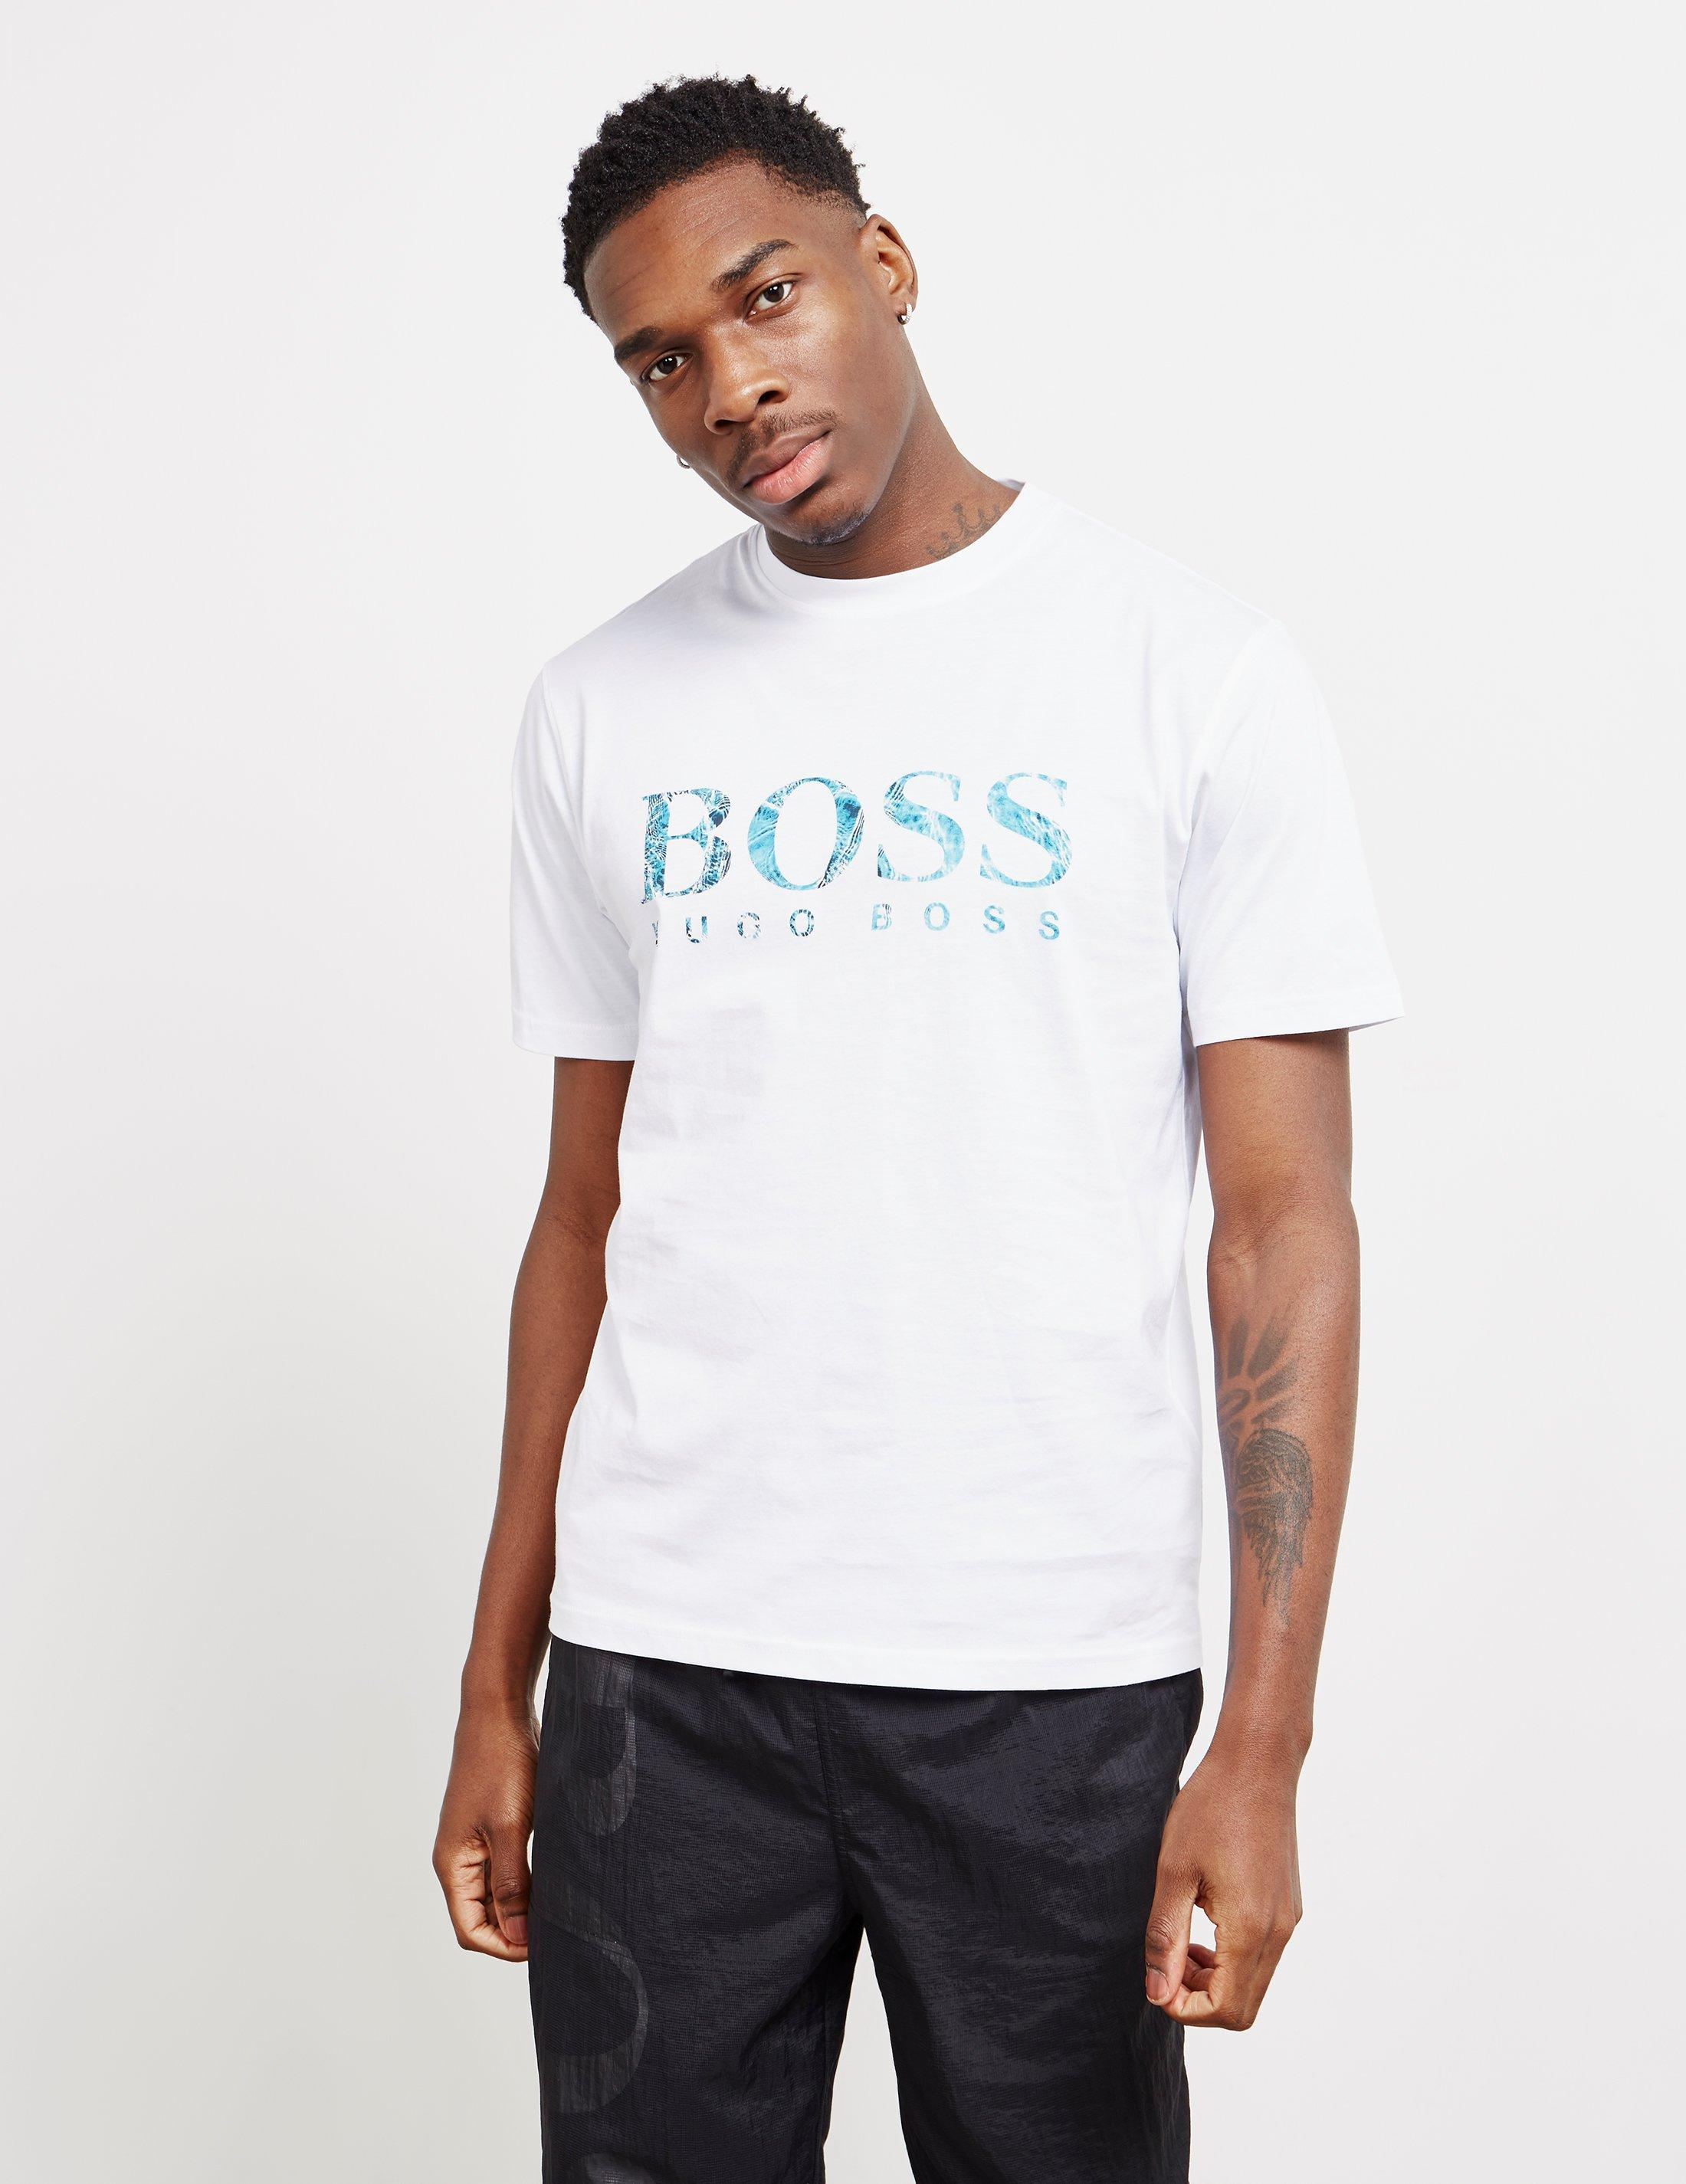 55f8c6a9 BOSS - Mens Teecher Logo Short Sleeve T-shirt White for Men - Lyst. View  fullscreen